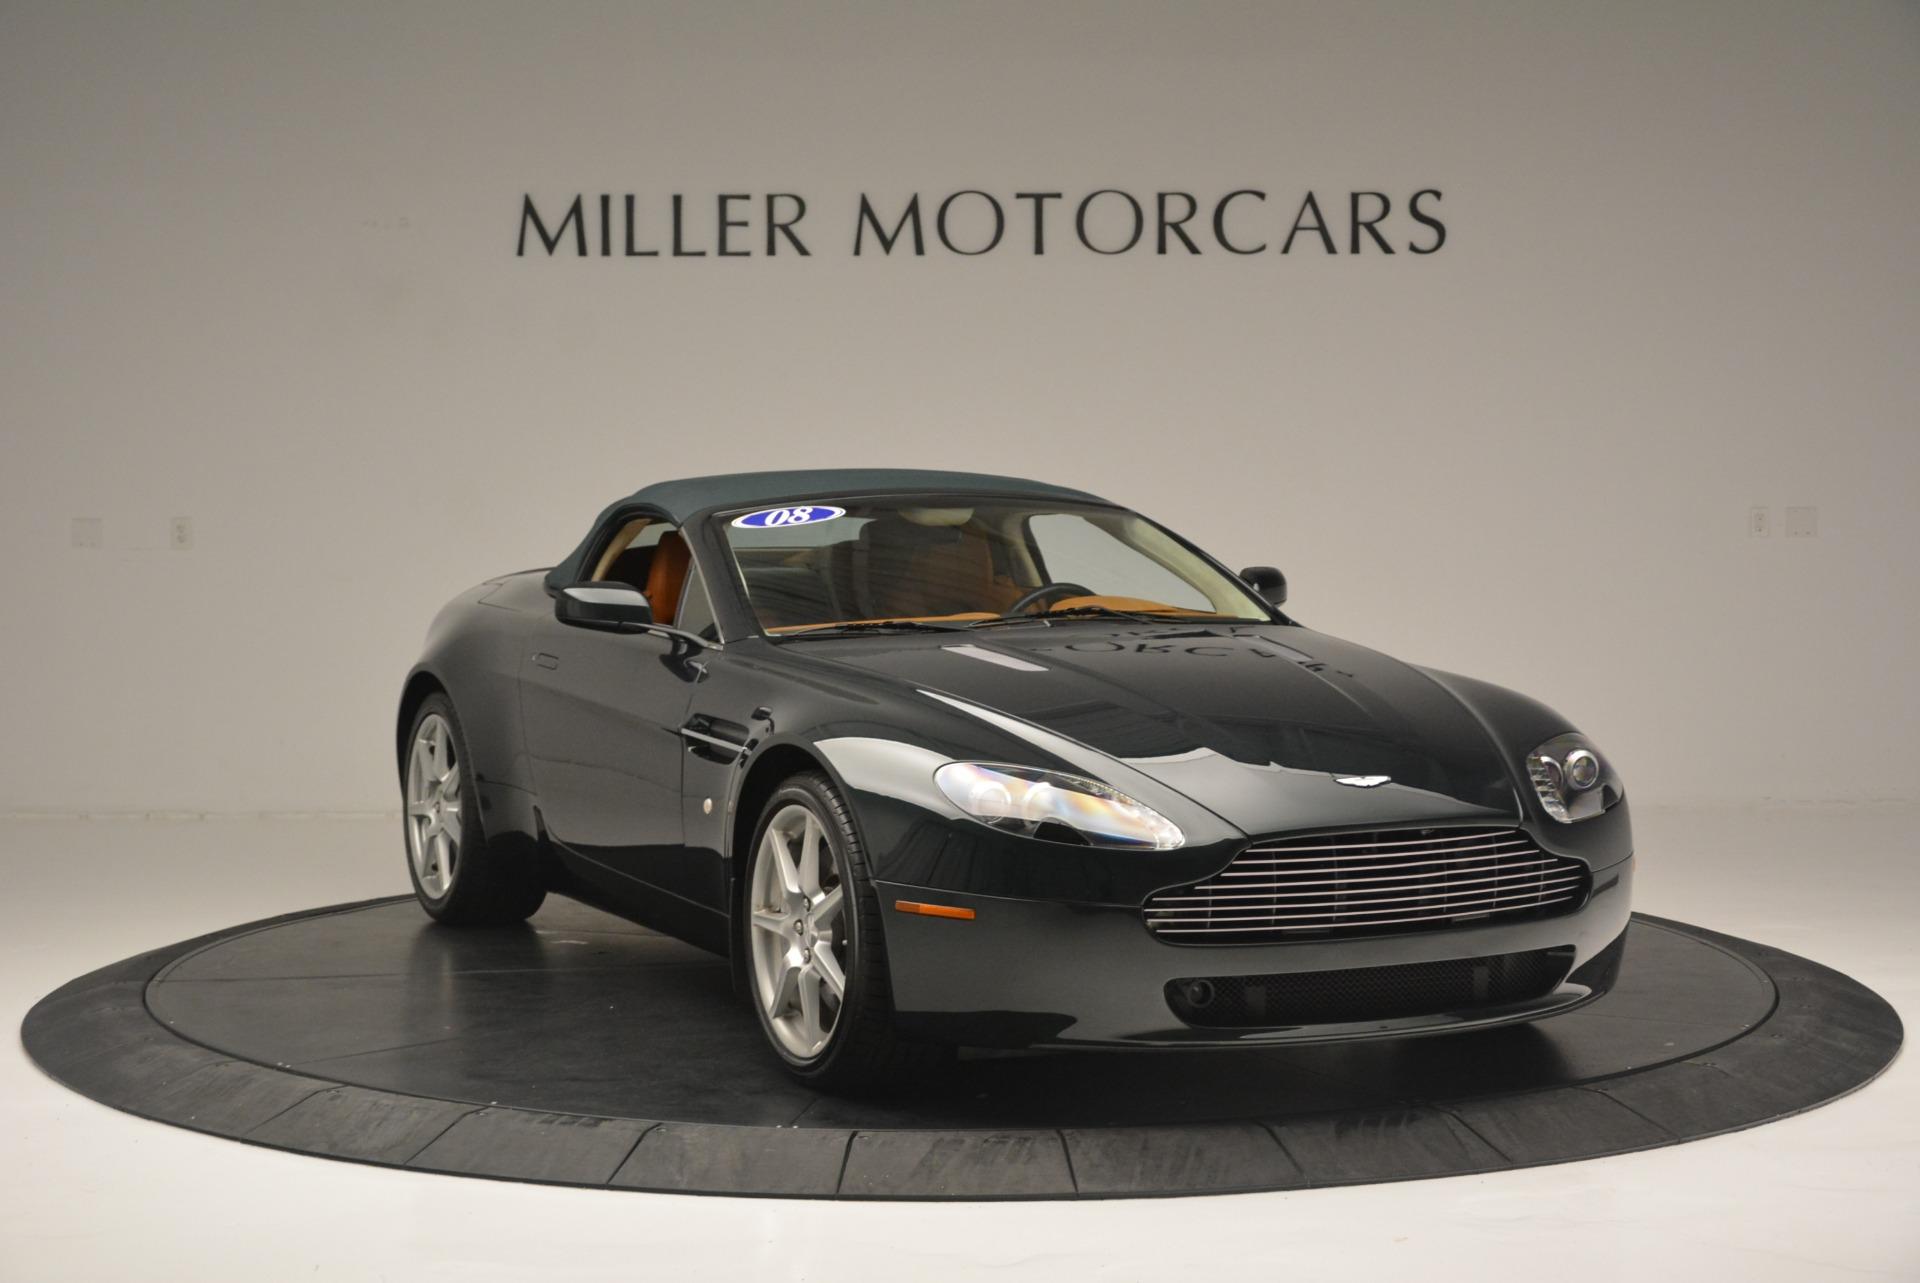 Aston Martin V Vantage Roadster Stock For Sale Near - Aston martin vantage price used